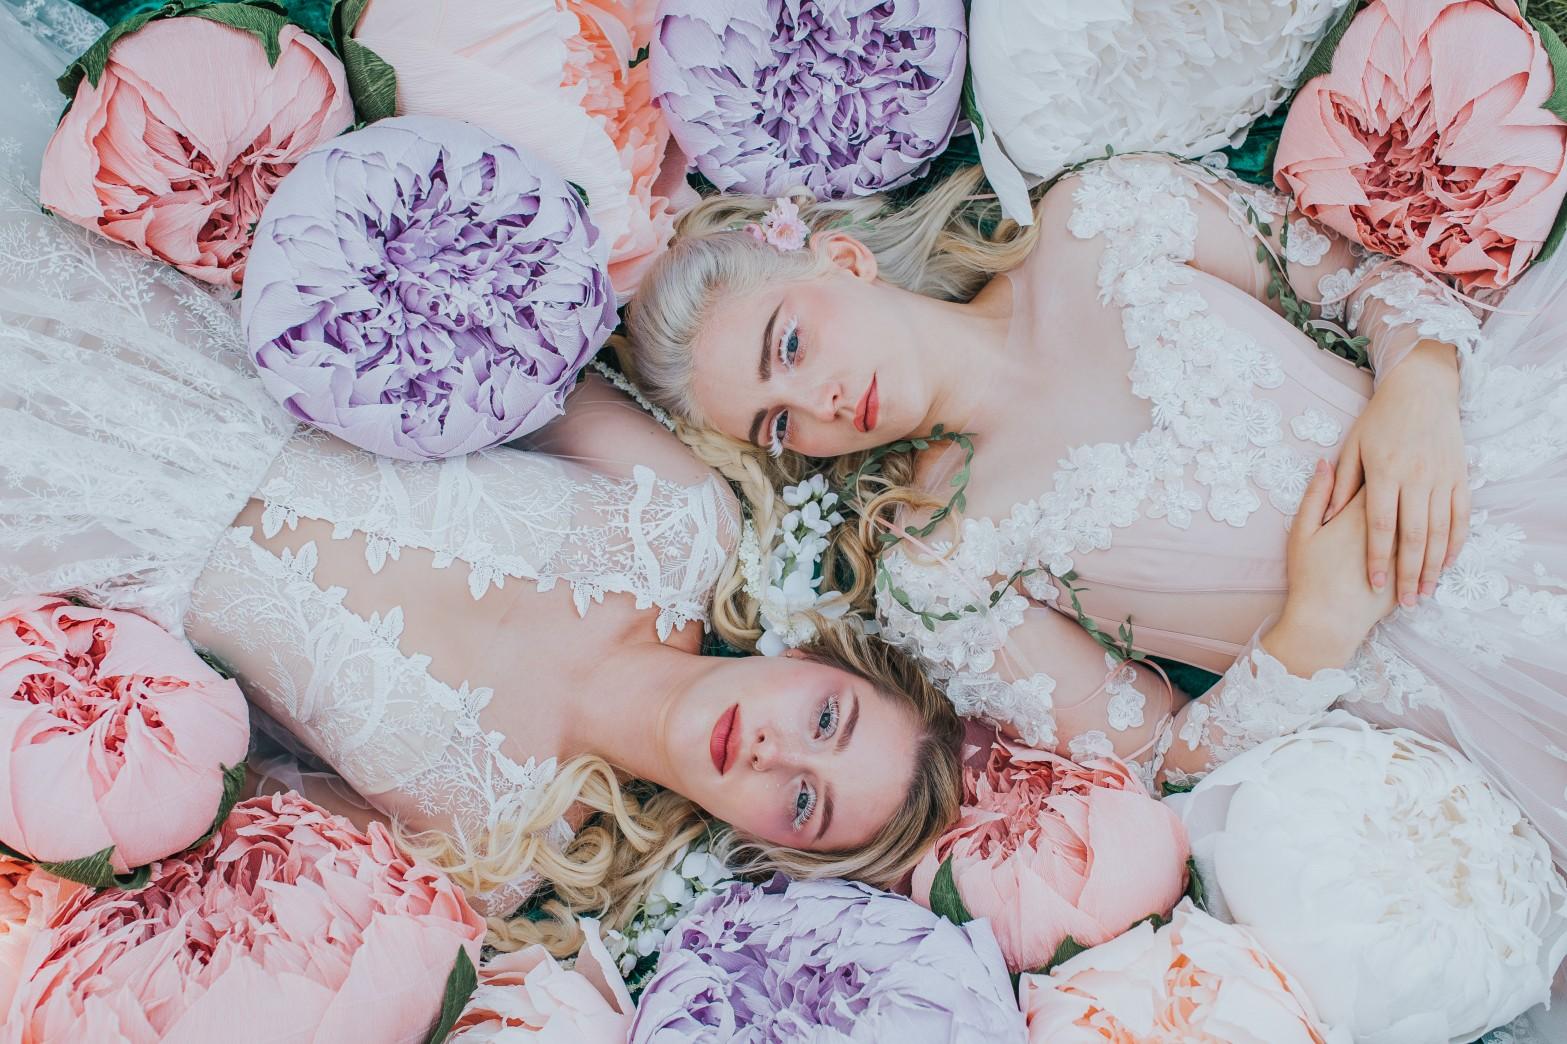 fairy wedding - whimsical wedding - magical wedding - elegant wedding dress - unique wedding dresses - fairytale wedding makeup - artistic wedding photos